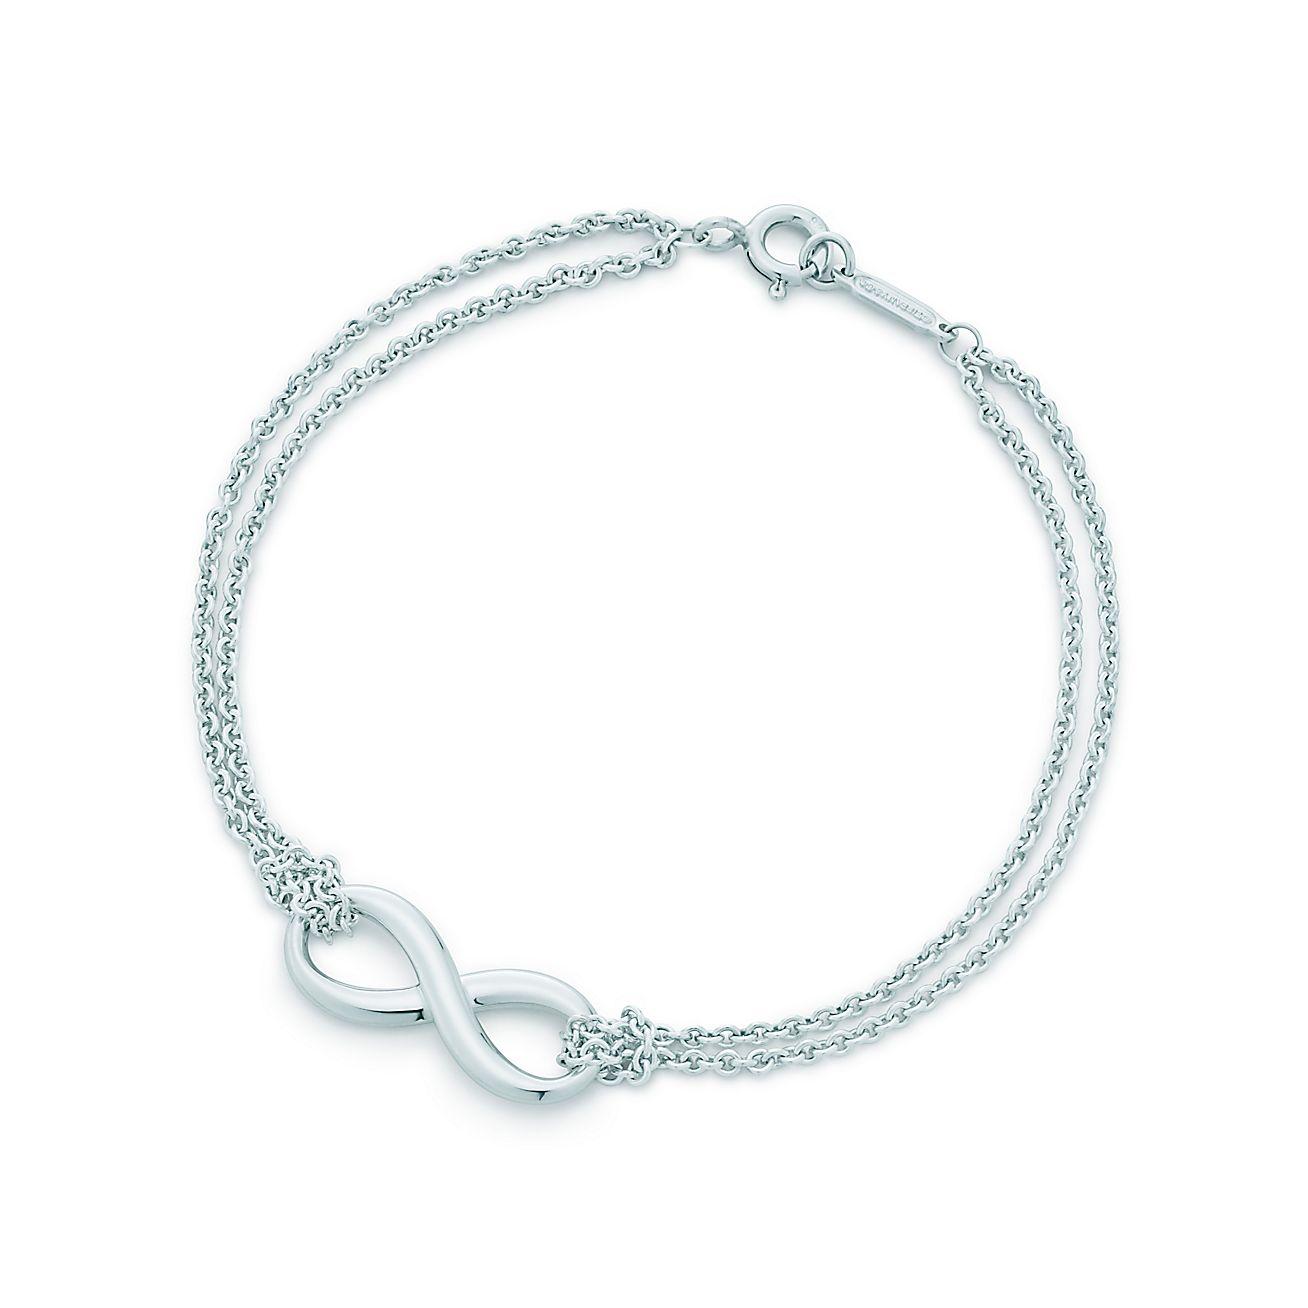 New Tiffany Infinity Bracelet In Sterling Silver, Medium